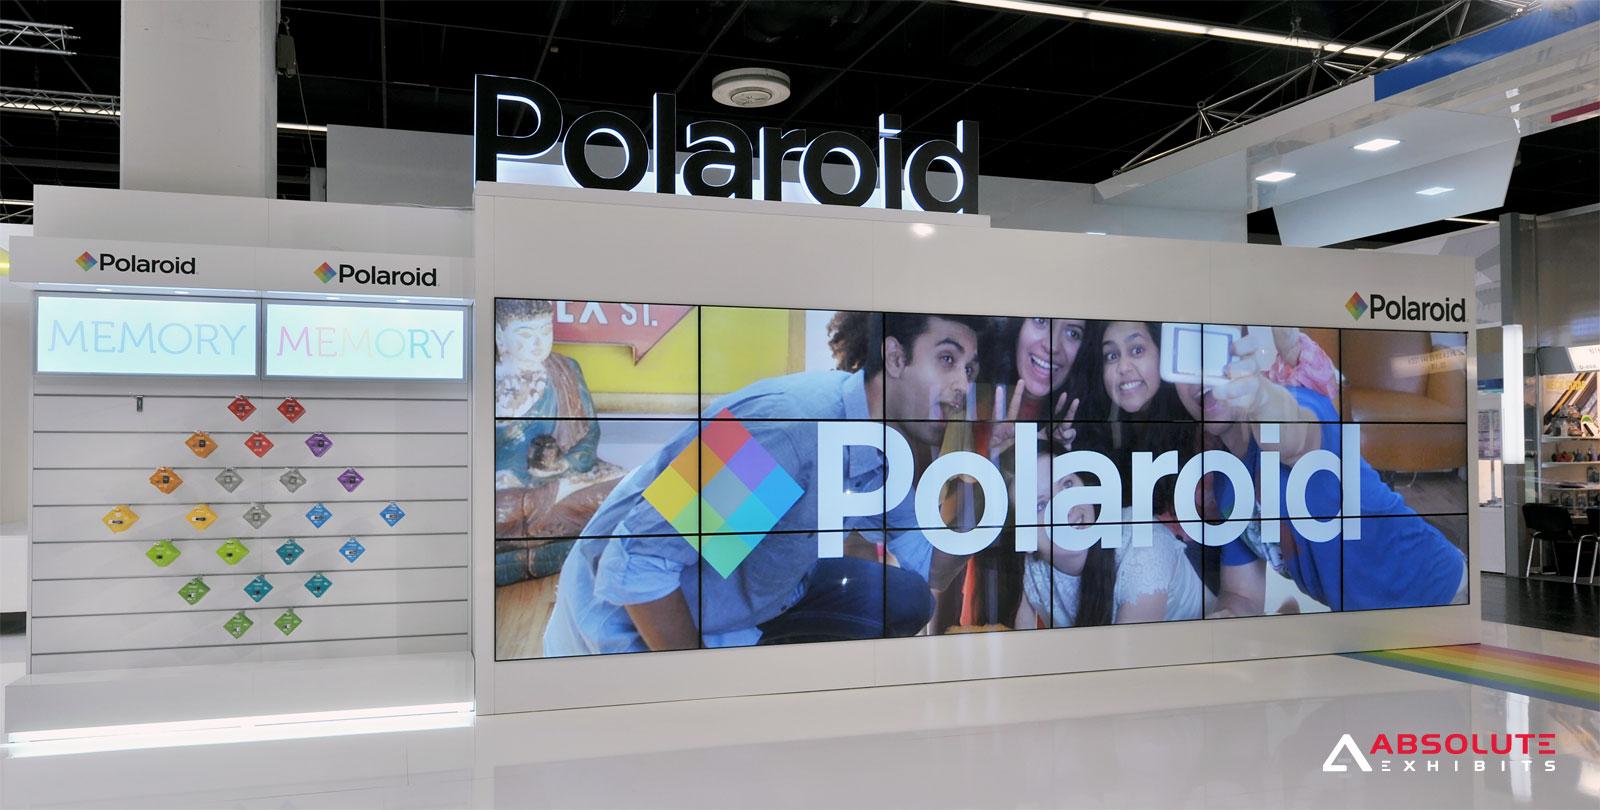 video wall, polaroid, photokina 2016